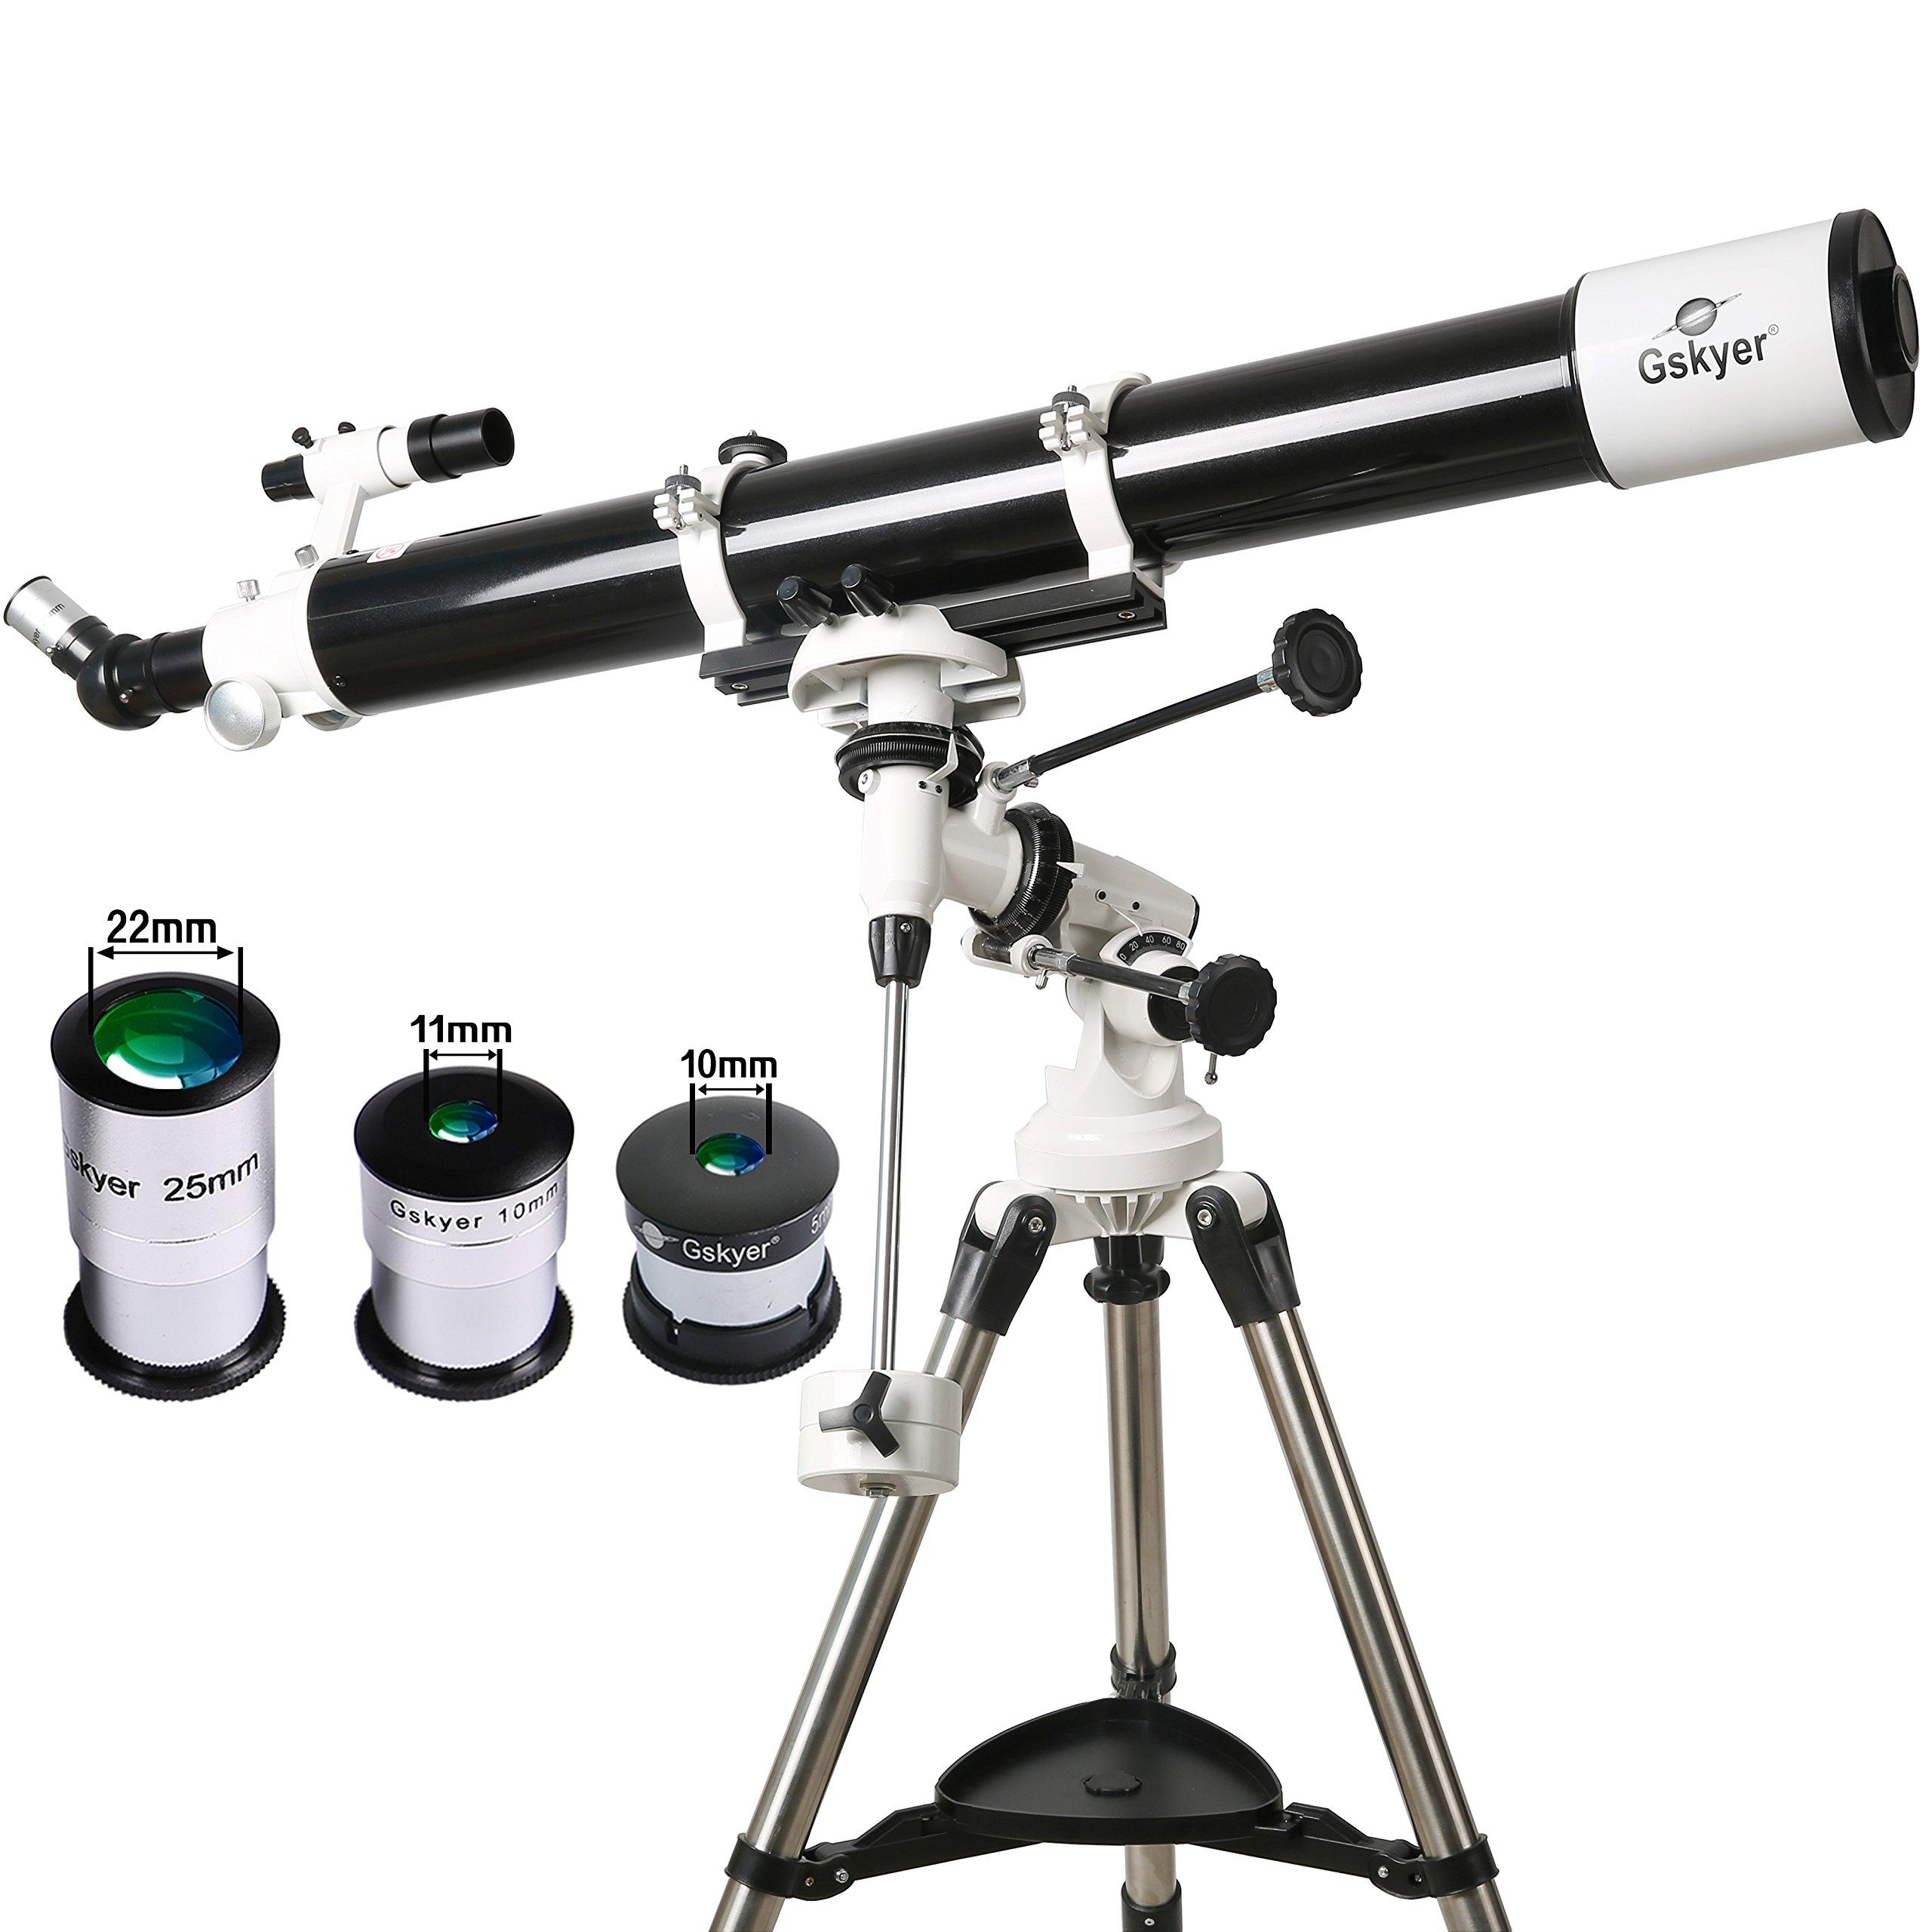 Gskyer Telescope, EQ901000 Astronomy Telescope, German Technology Refractor Telescope by Gskyer